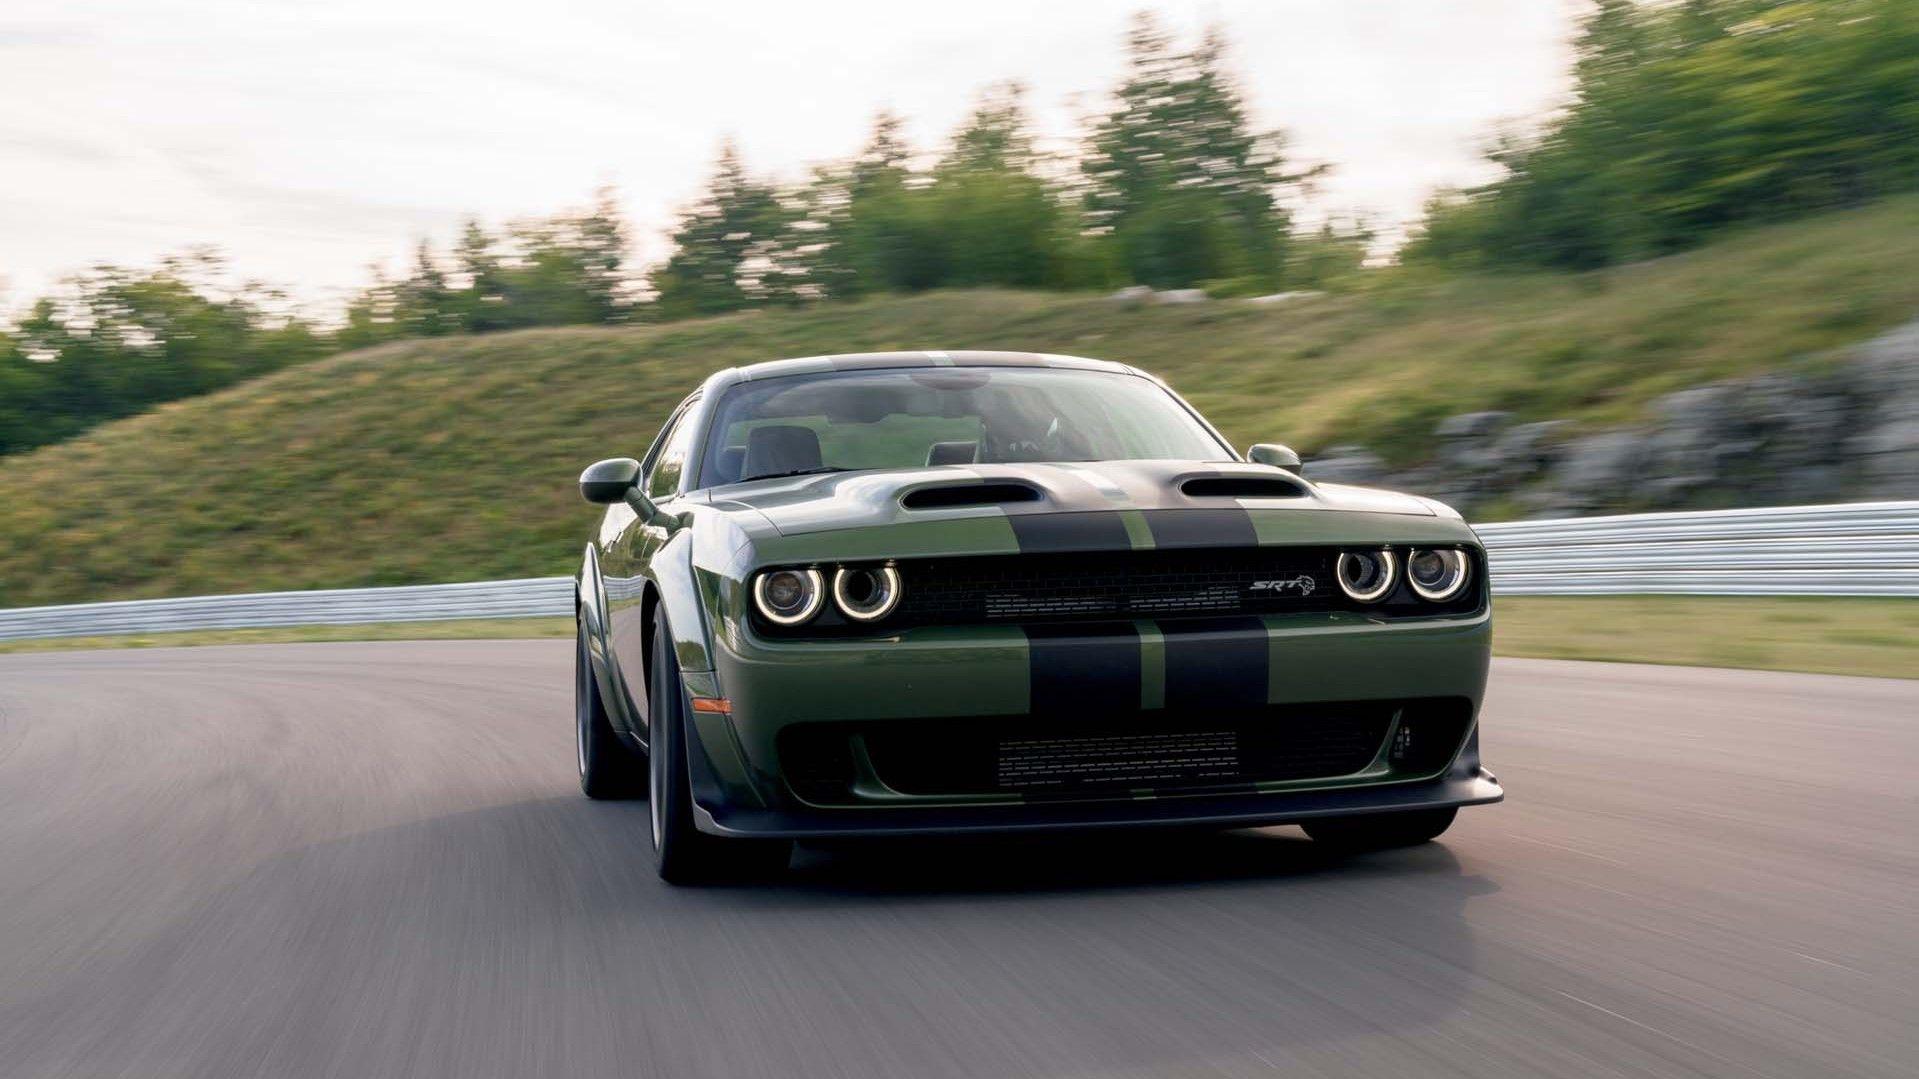 Dodge Demon Horsepower 2020 Price Di 2020